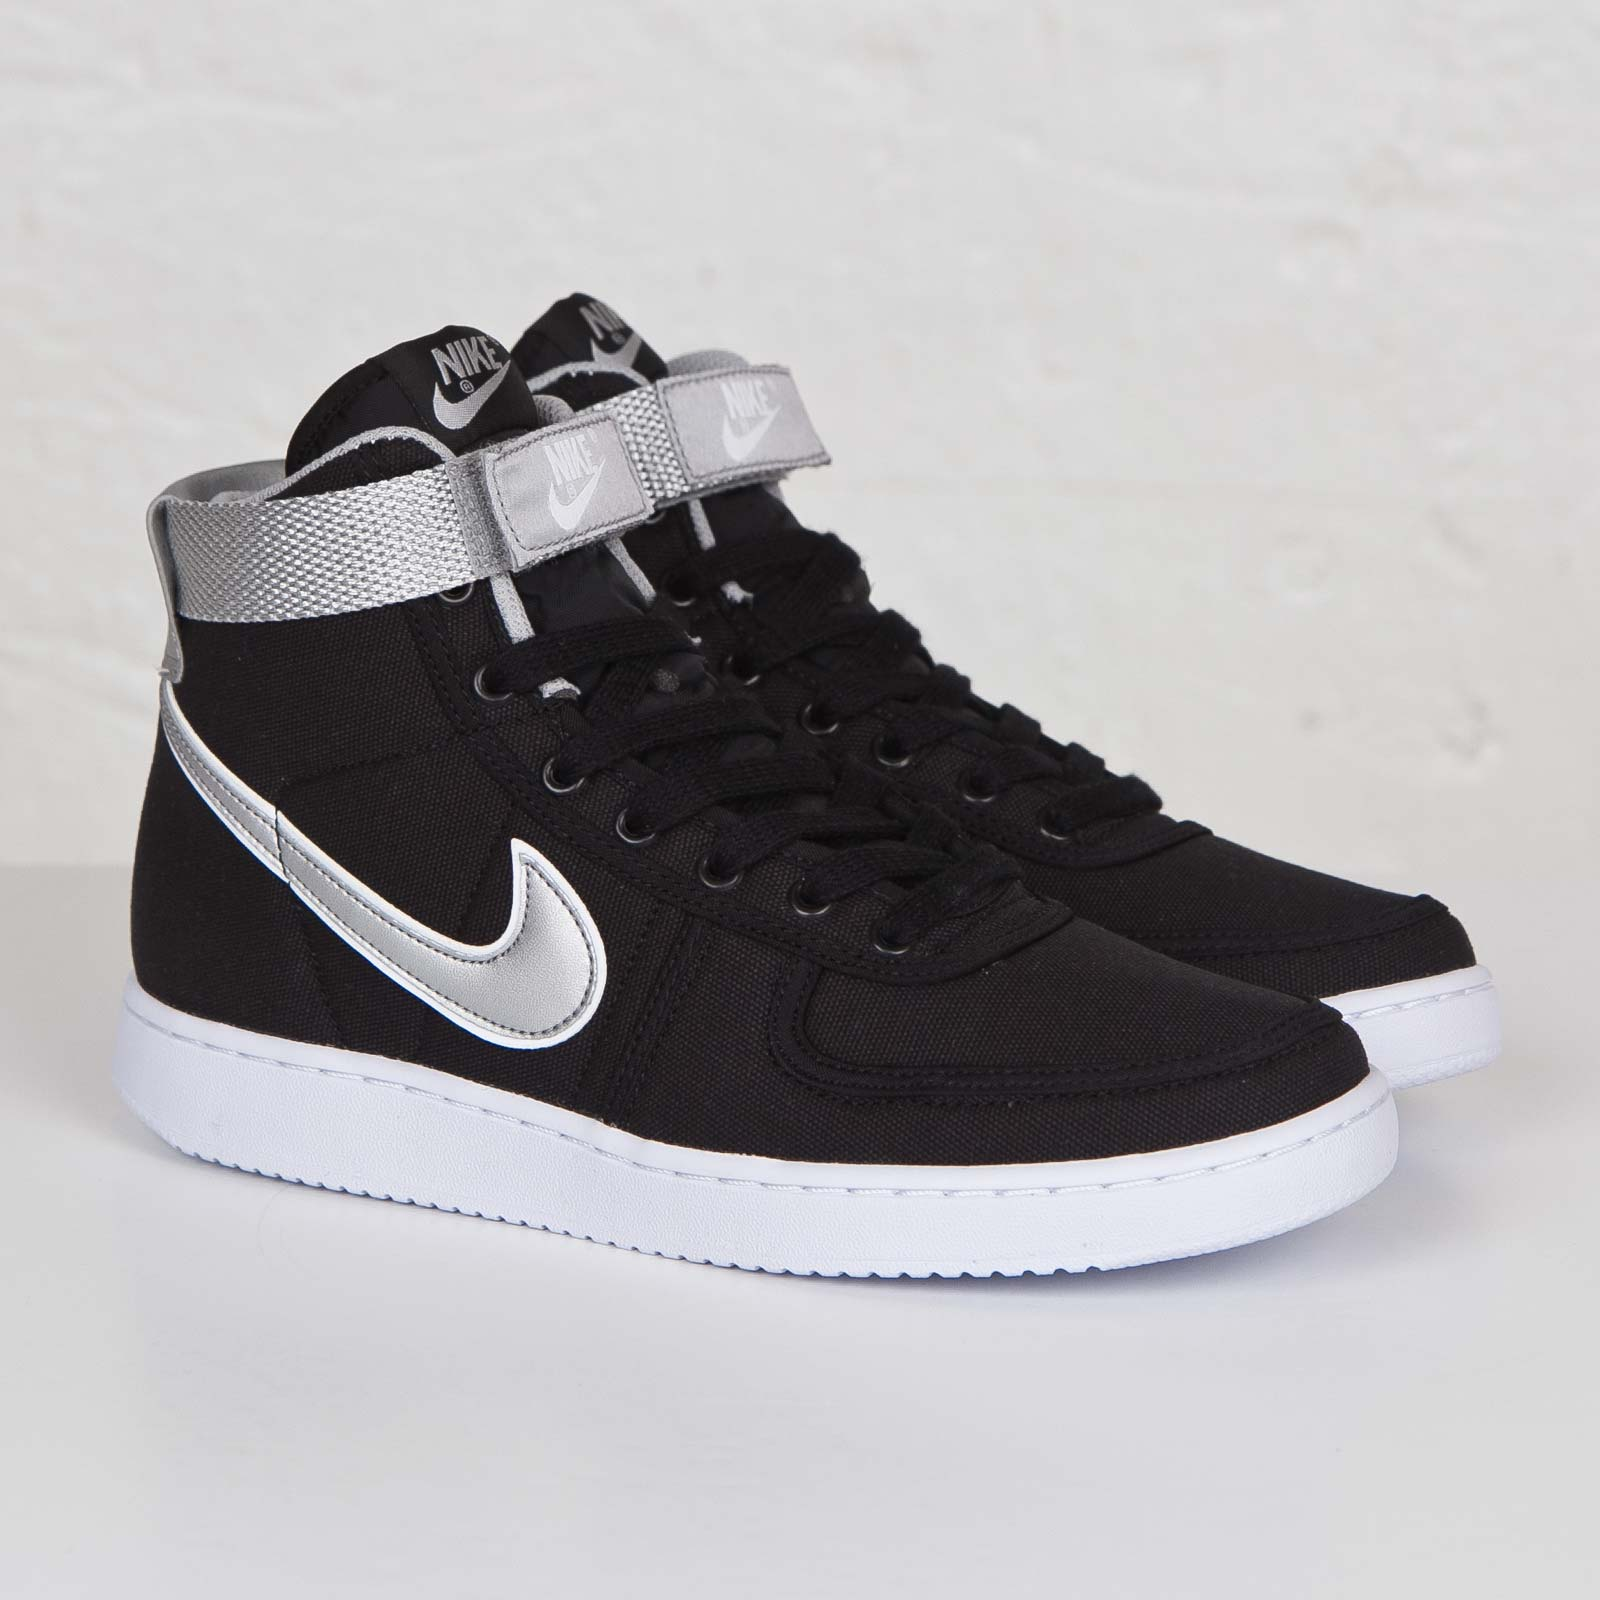 Nike Vandal High SP - 806970-010